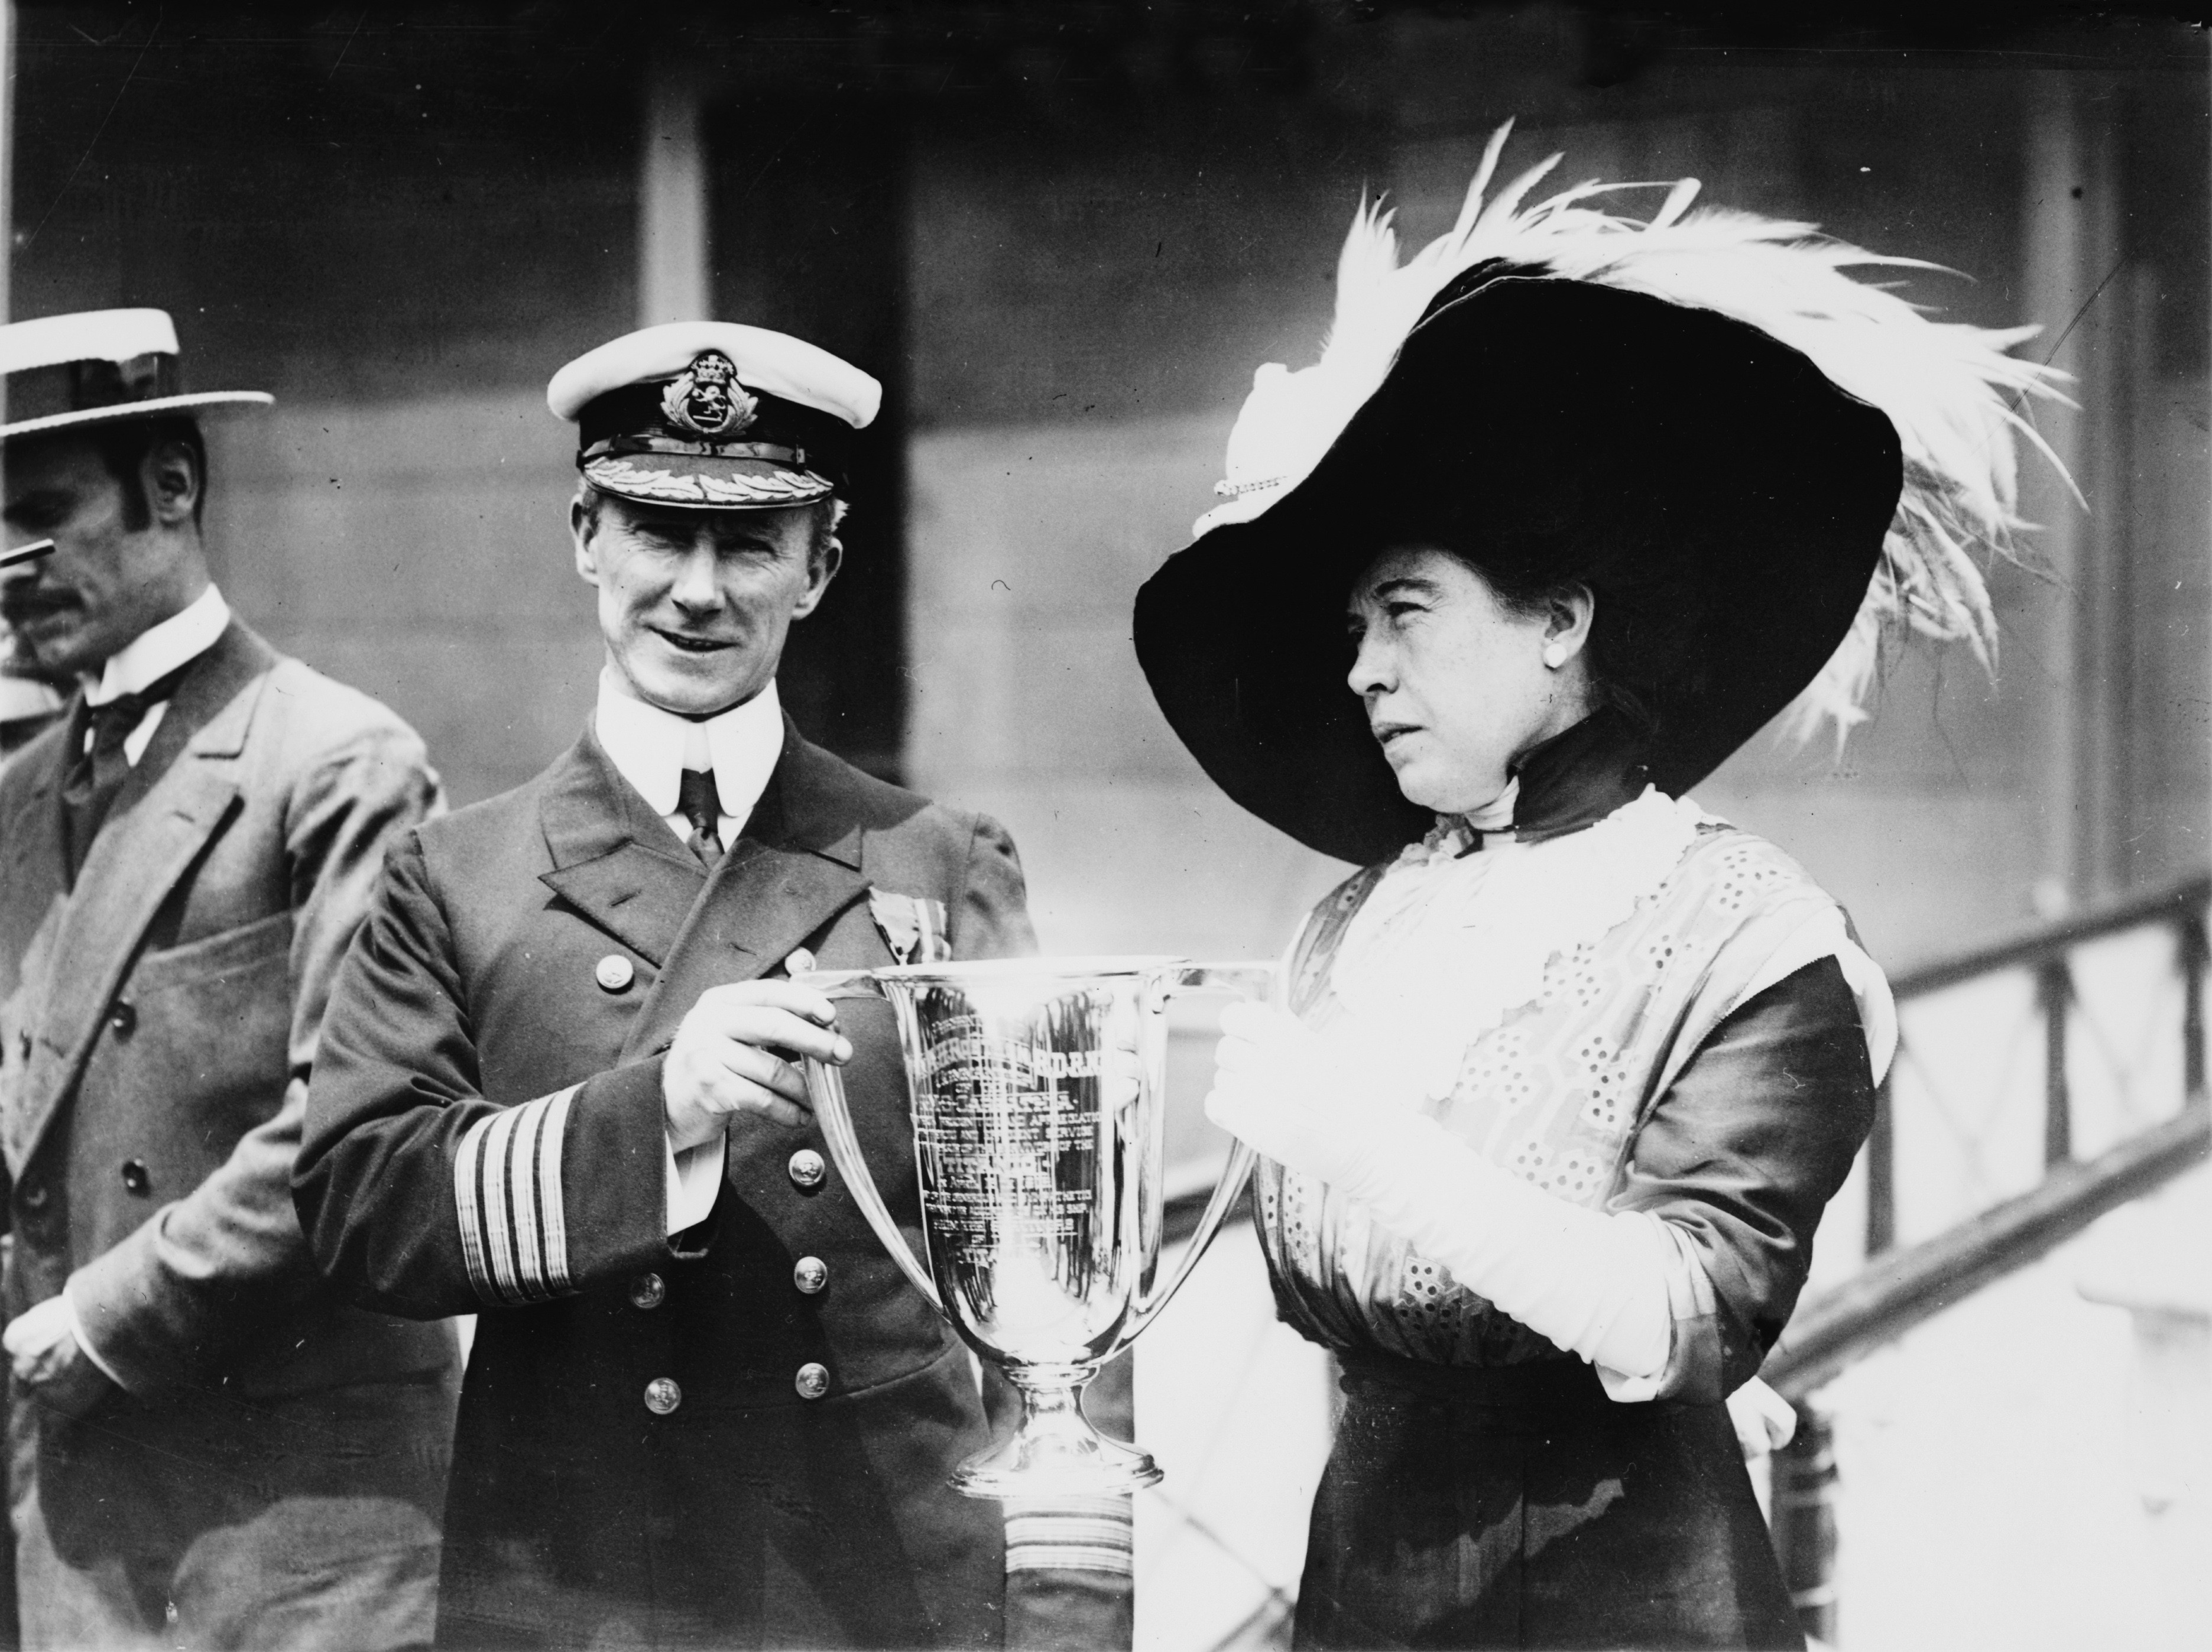 File:Molly brown rescue award titanic.jpg - Wikimedia Commons